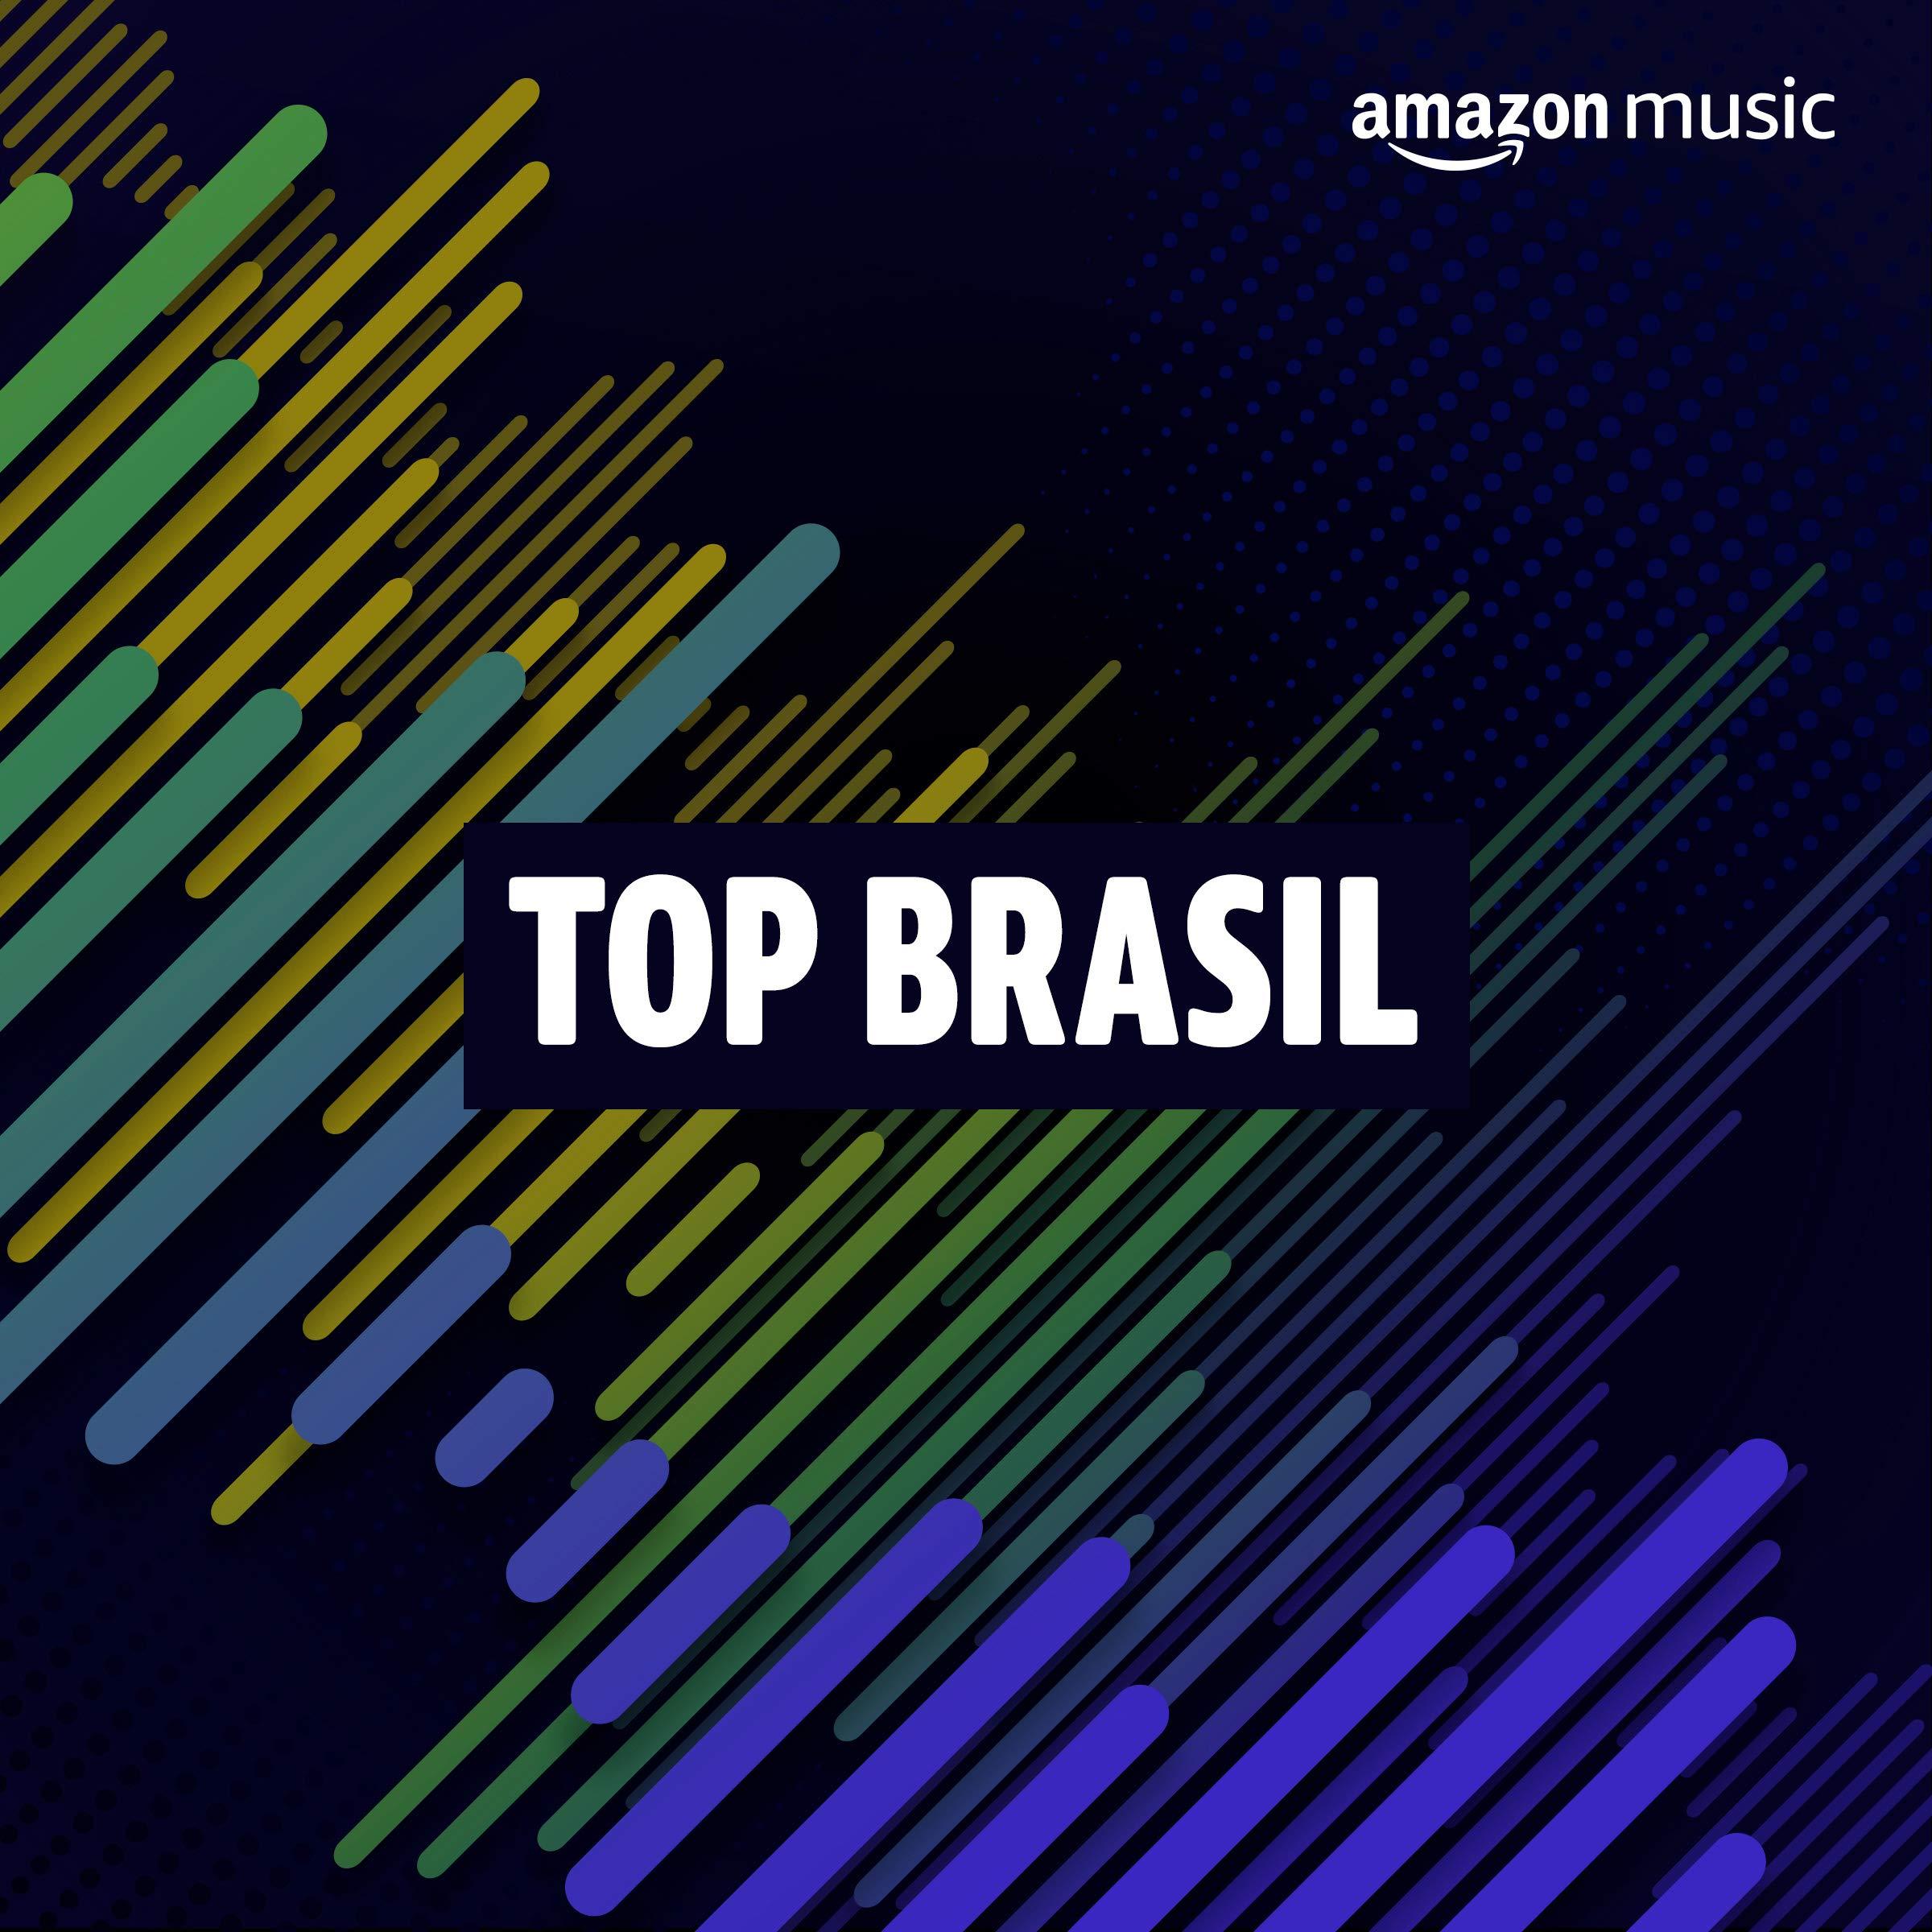 Matuê em Amazon Music Unlimited